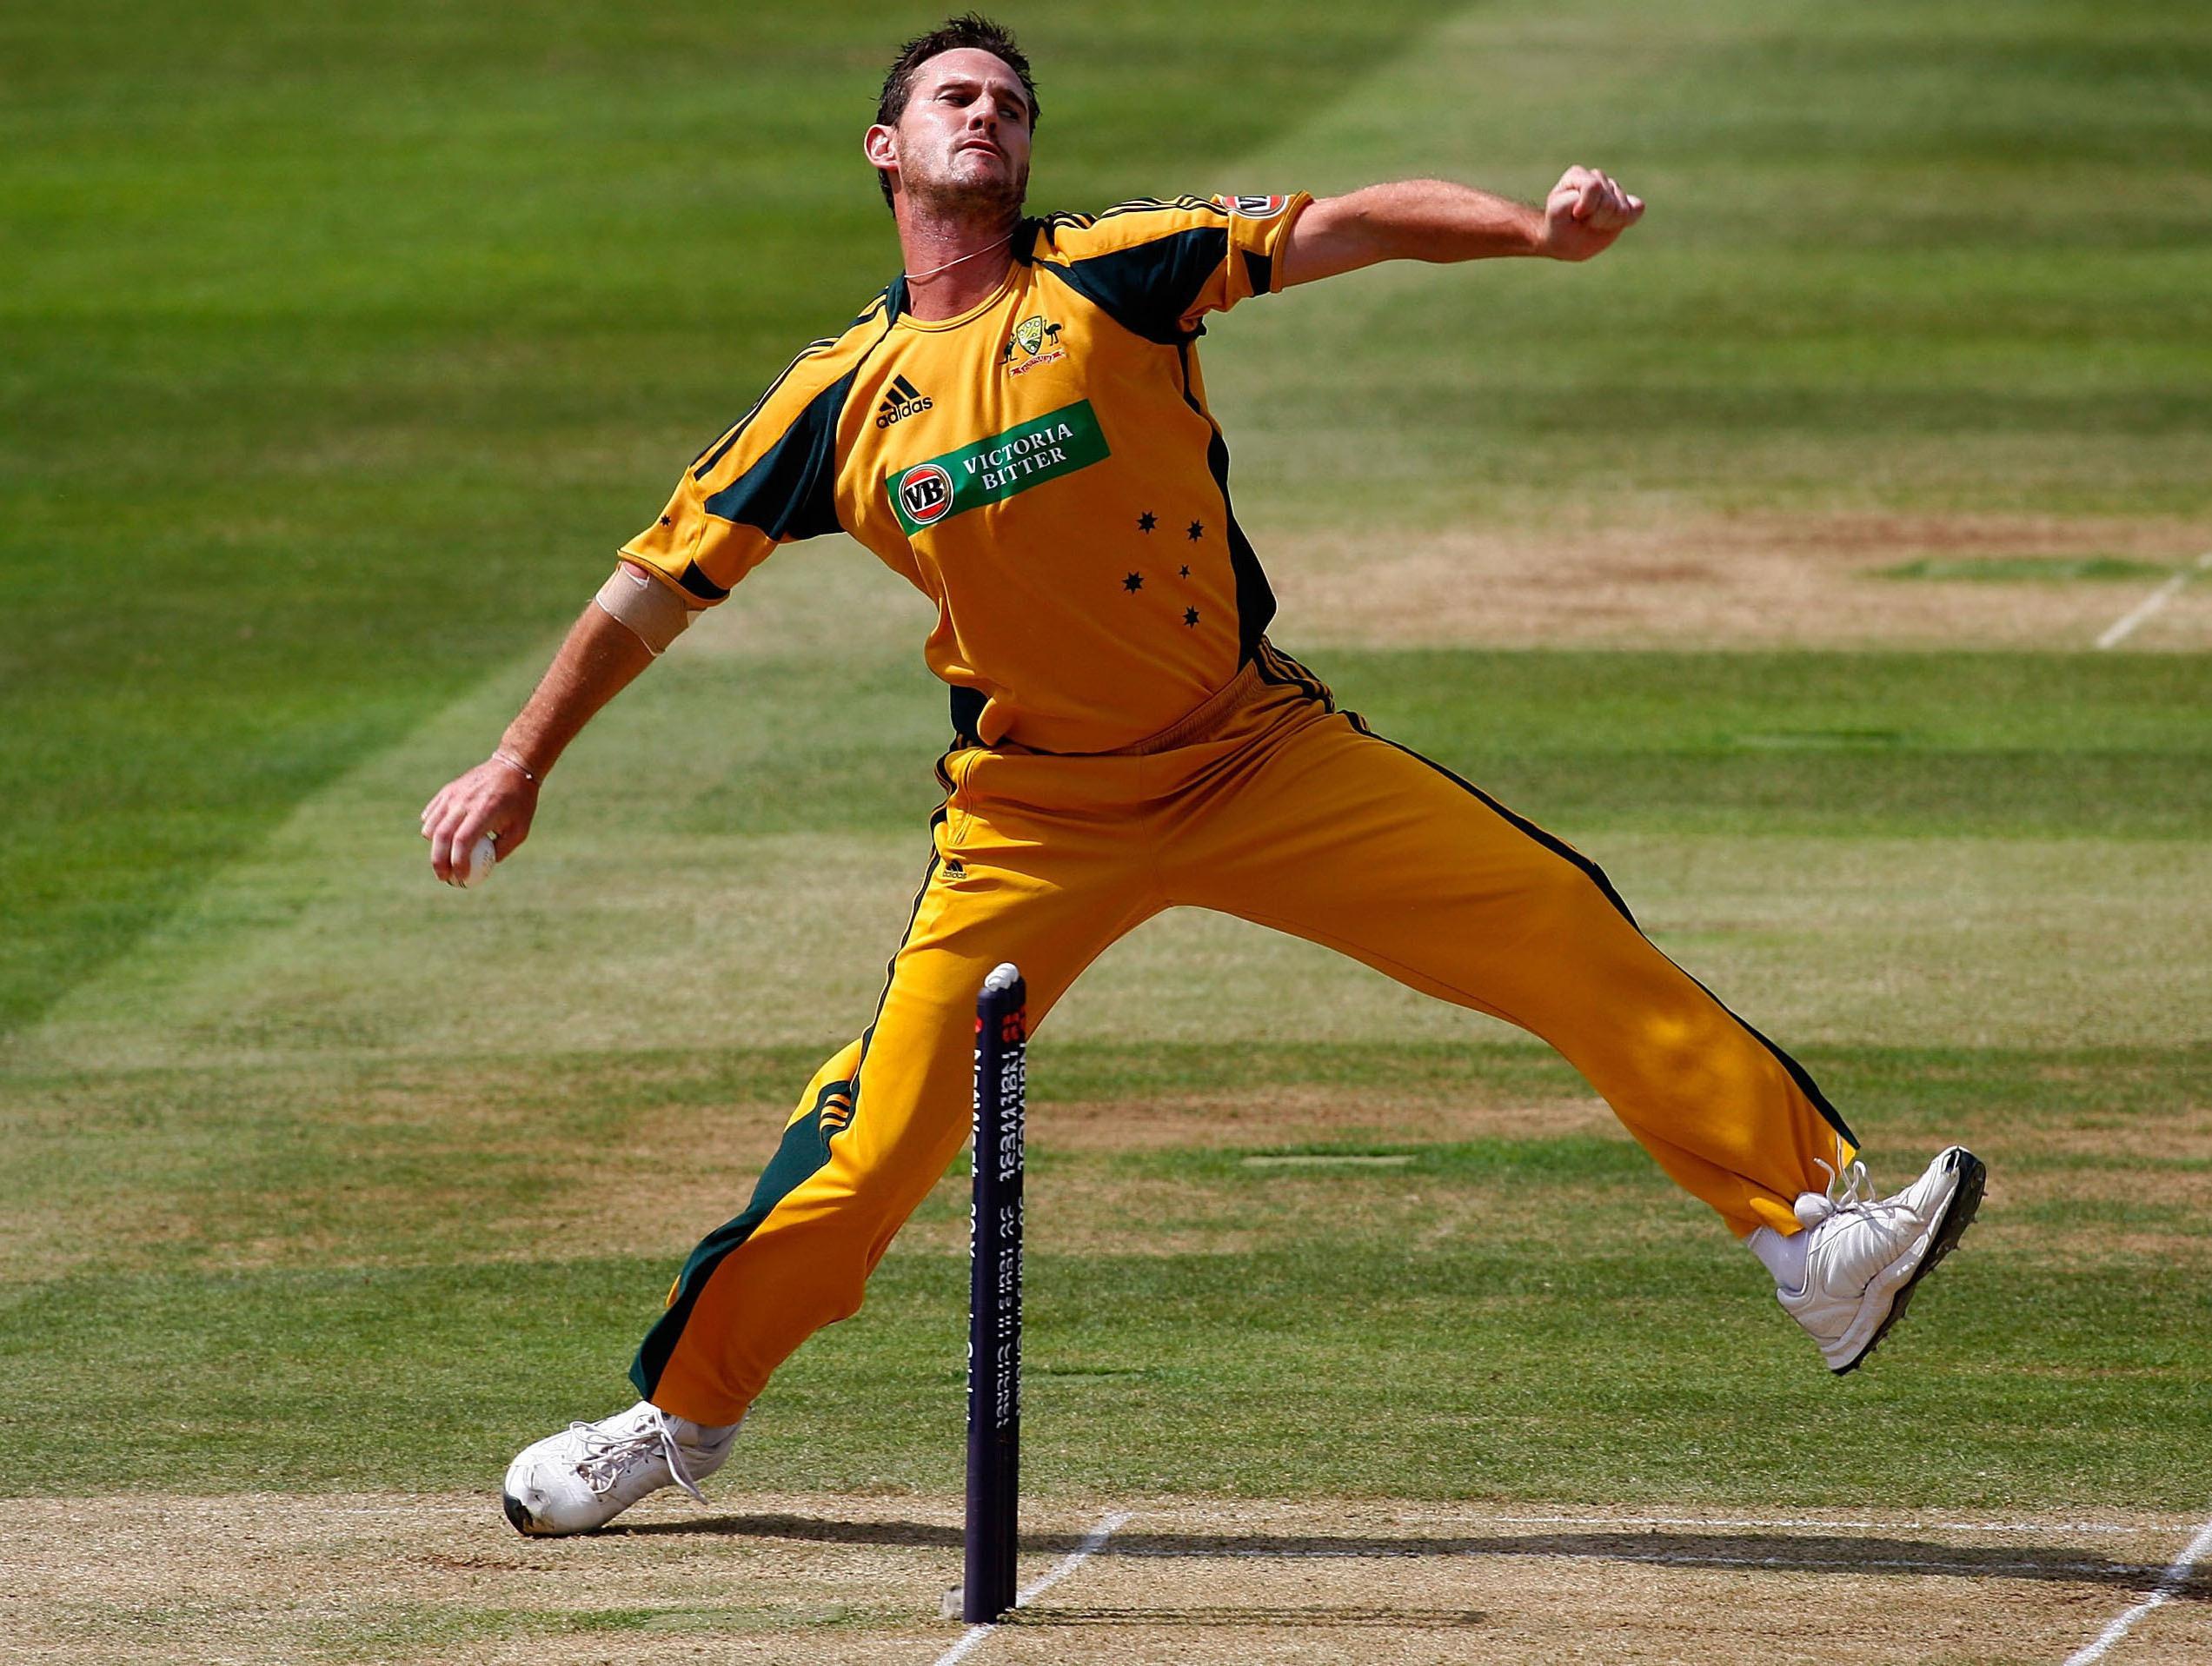 Australian Cricketer Shane Watson Picture - Shaun Tait Bowling Action , HD Wallpaper & Backgrounds